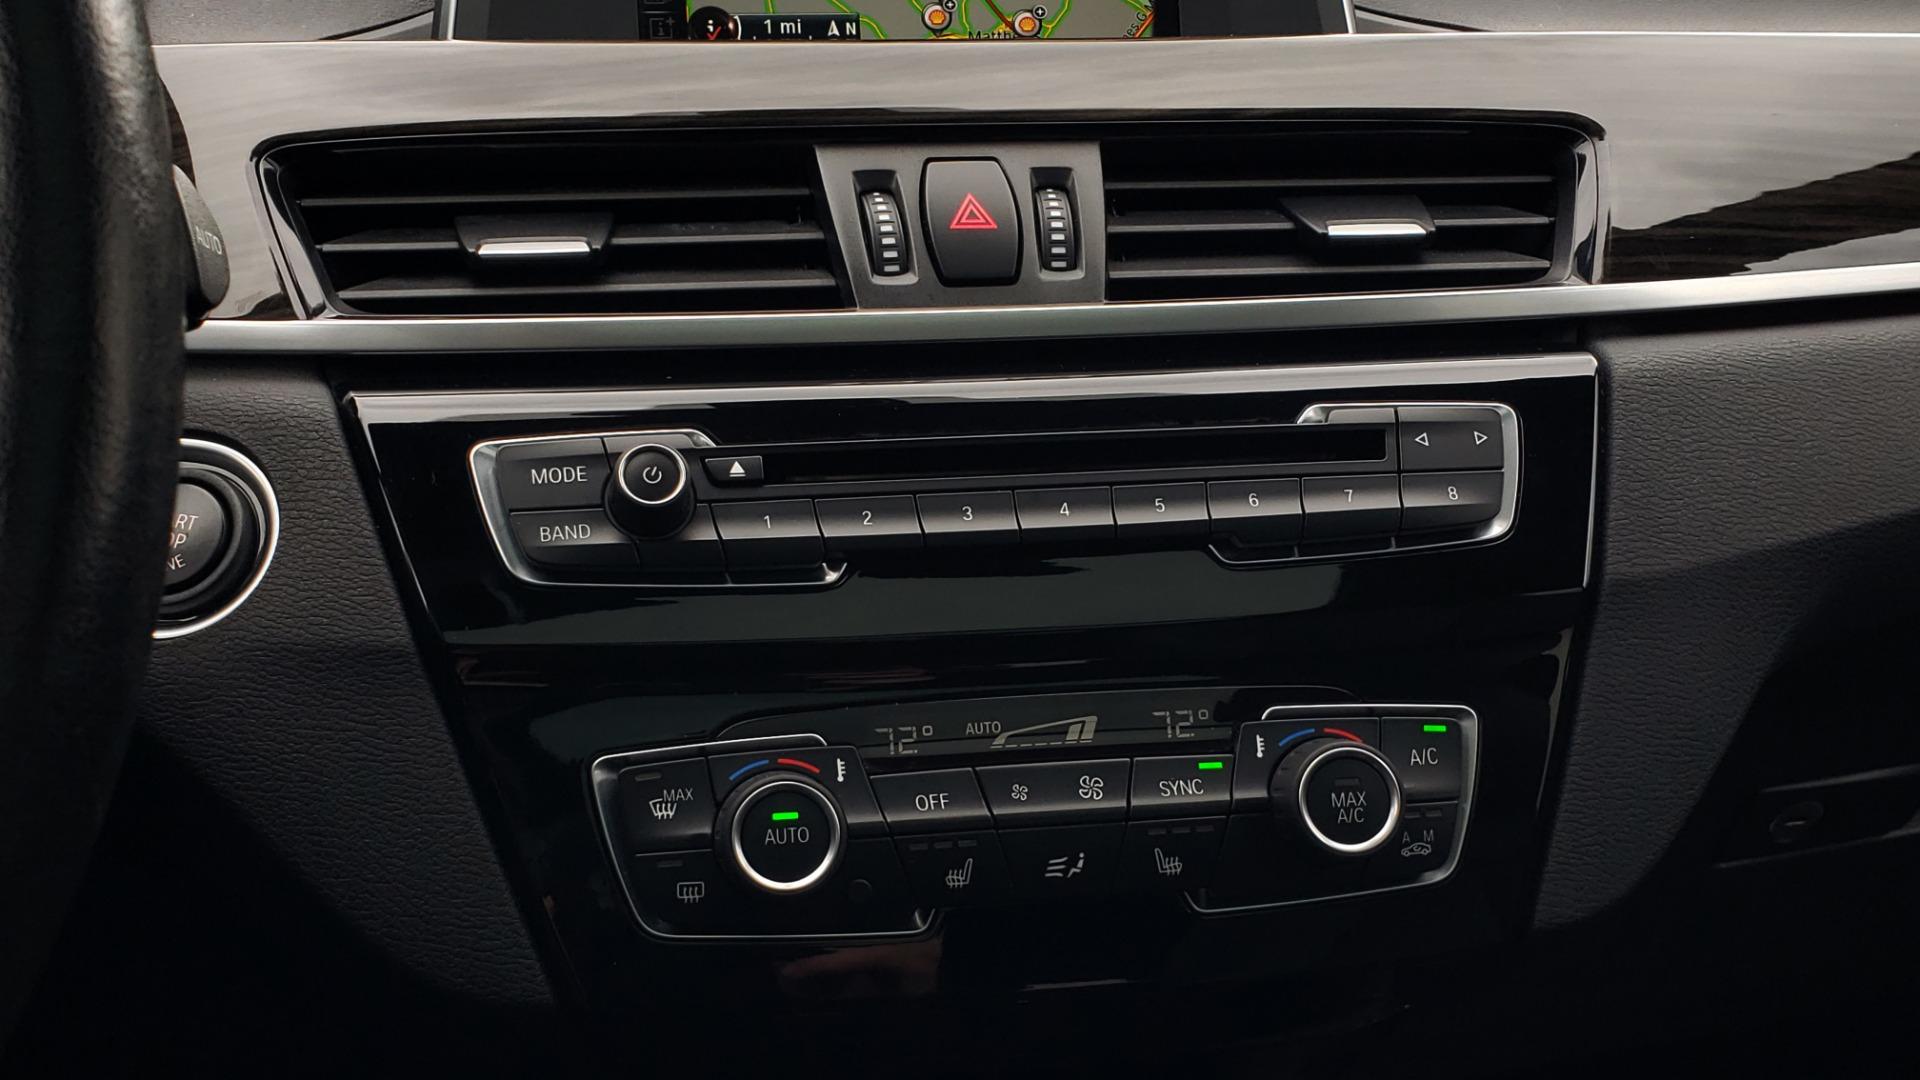 Used 2017 BMW X1 XDRIVE28I / PREM PKG / DRIVER ASST / NAV / CLD WTHR for sale Sold at Formula Imports in Charlotte NC 28227 50